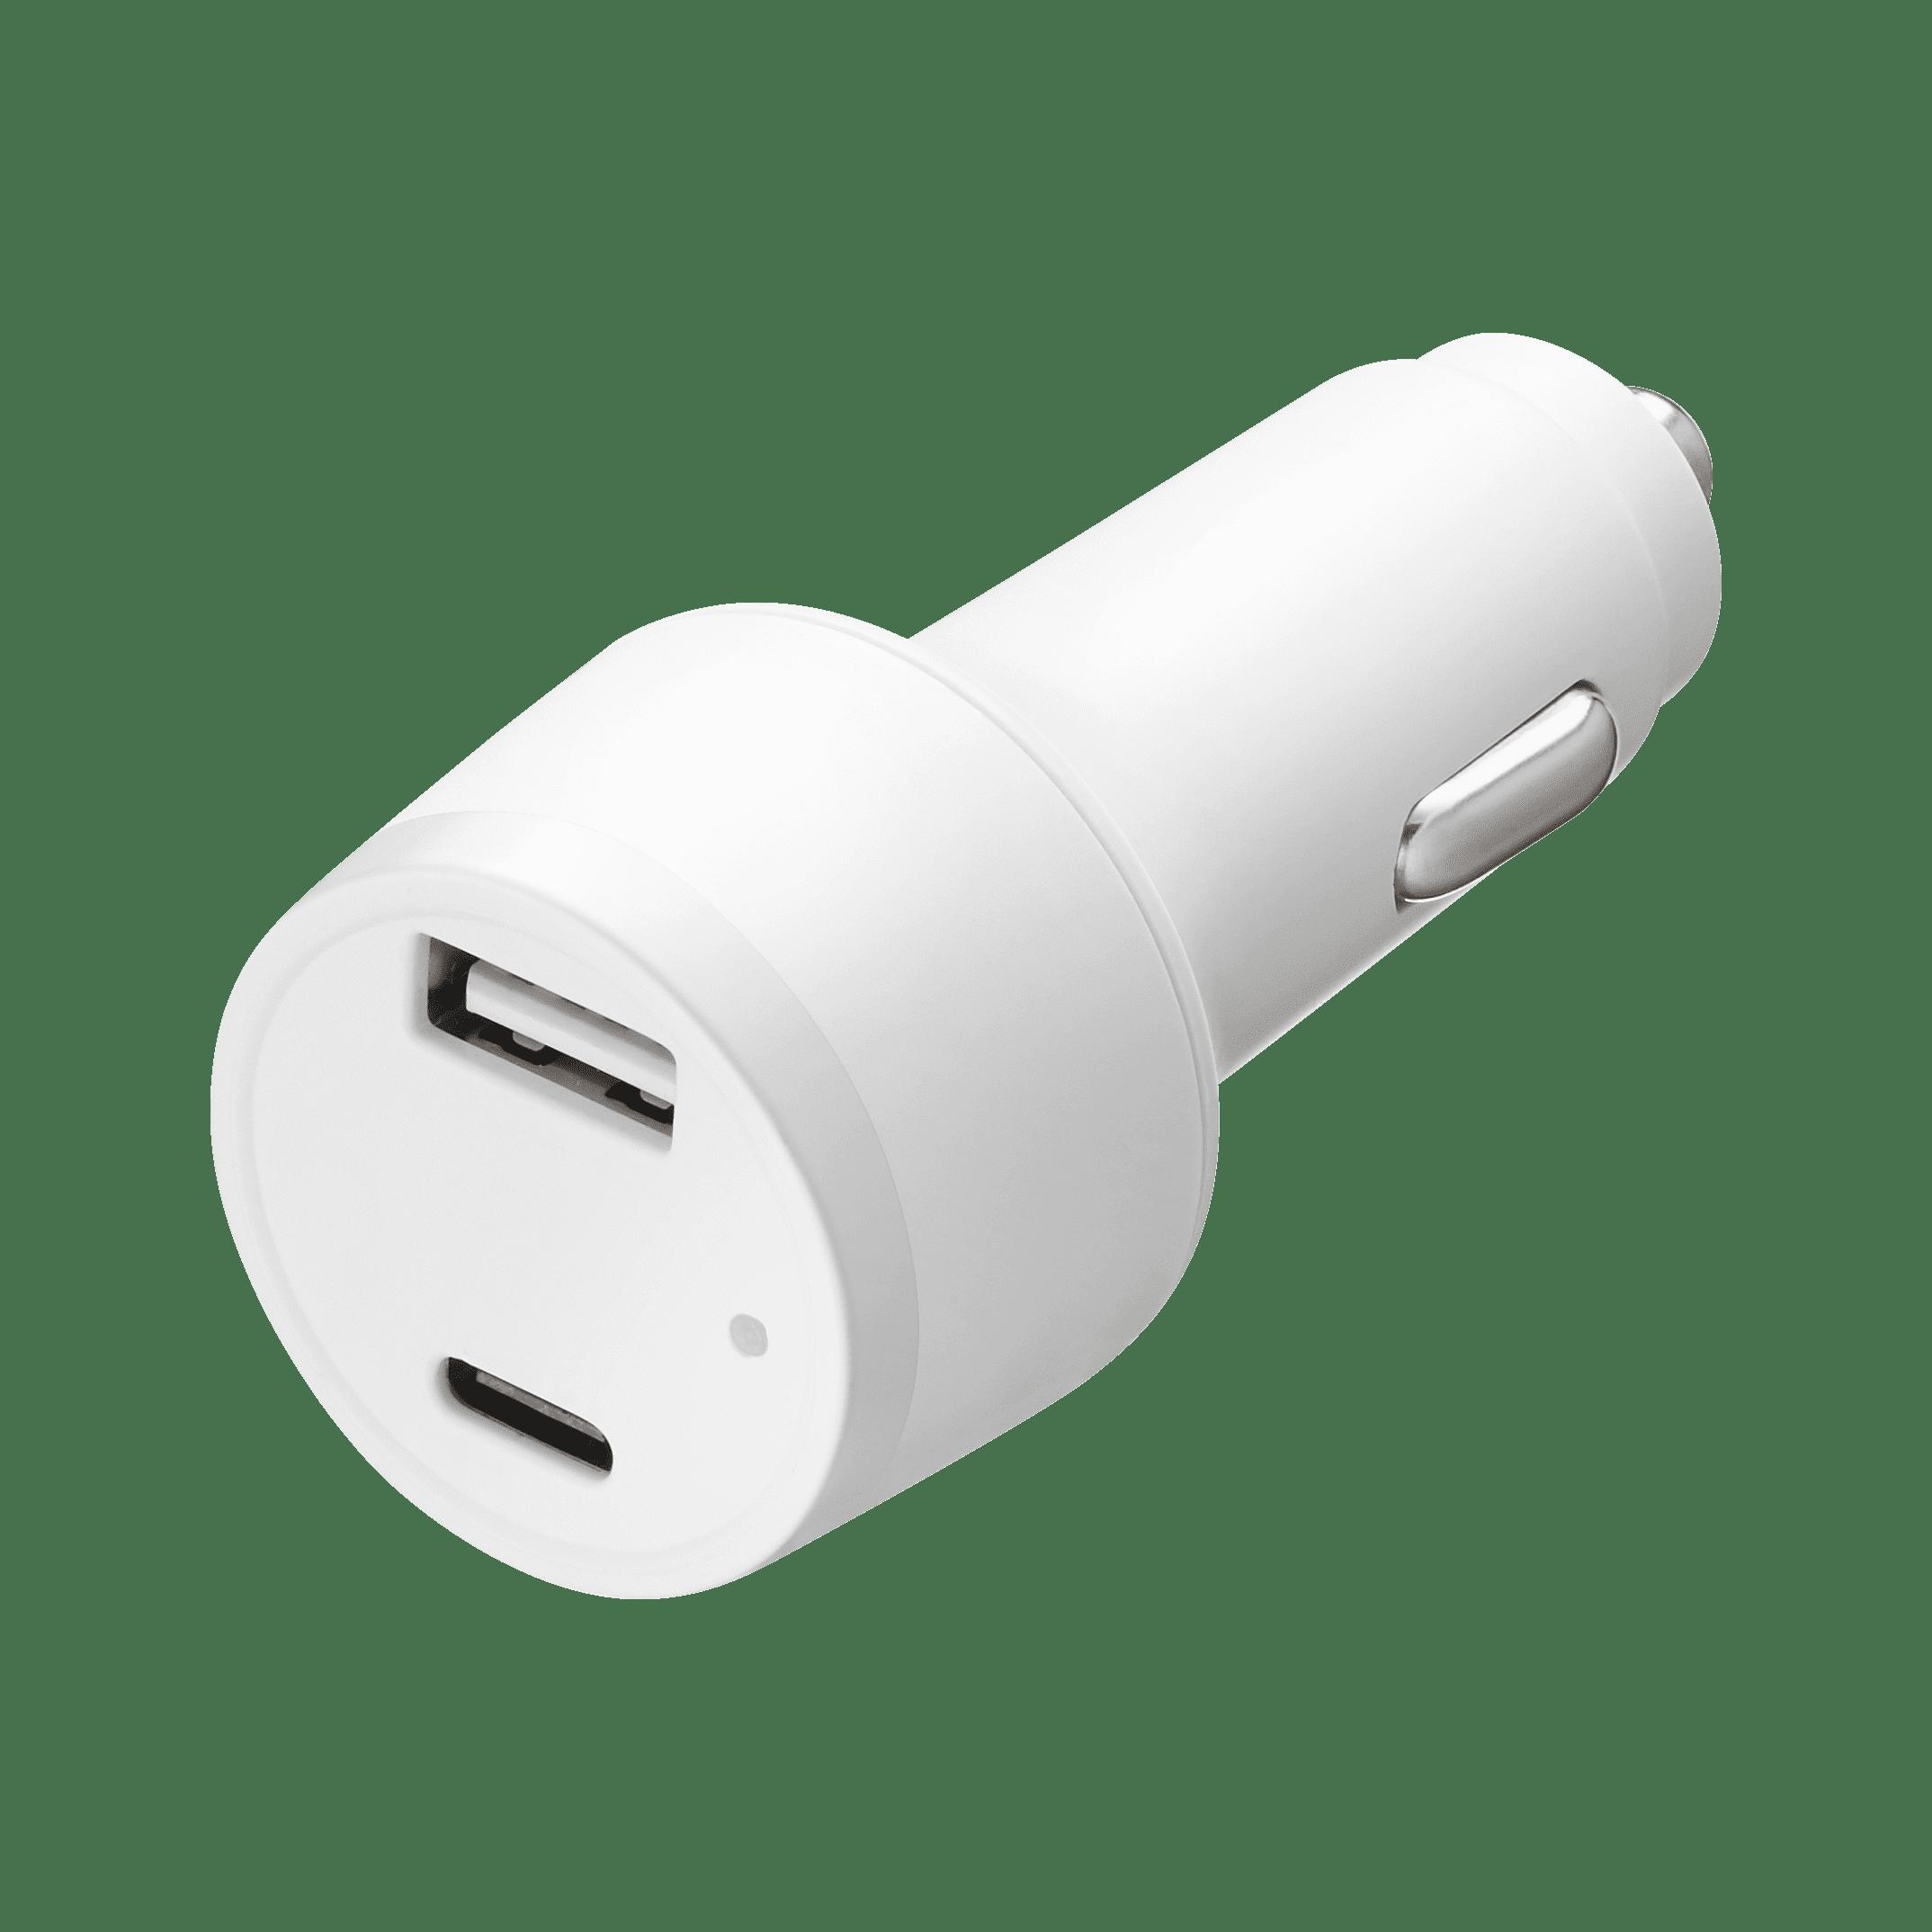 TPD-B42W24W 42W PD  USB C + USB A (2.4A) Type-C Car Charger